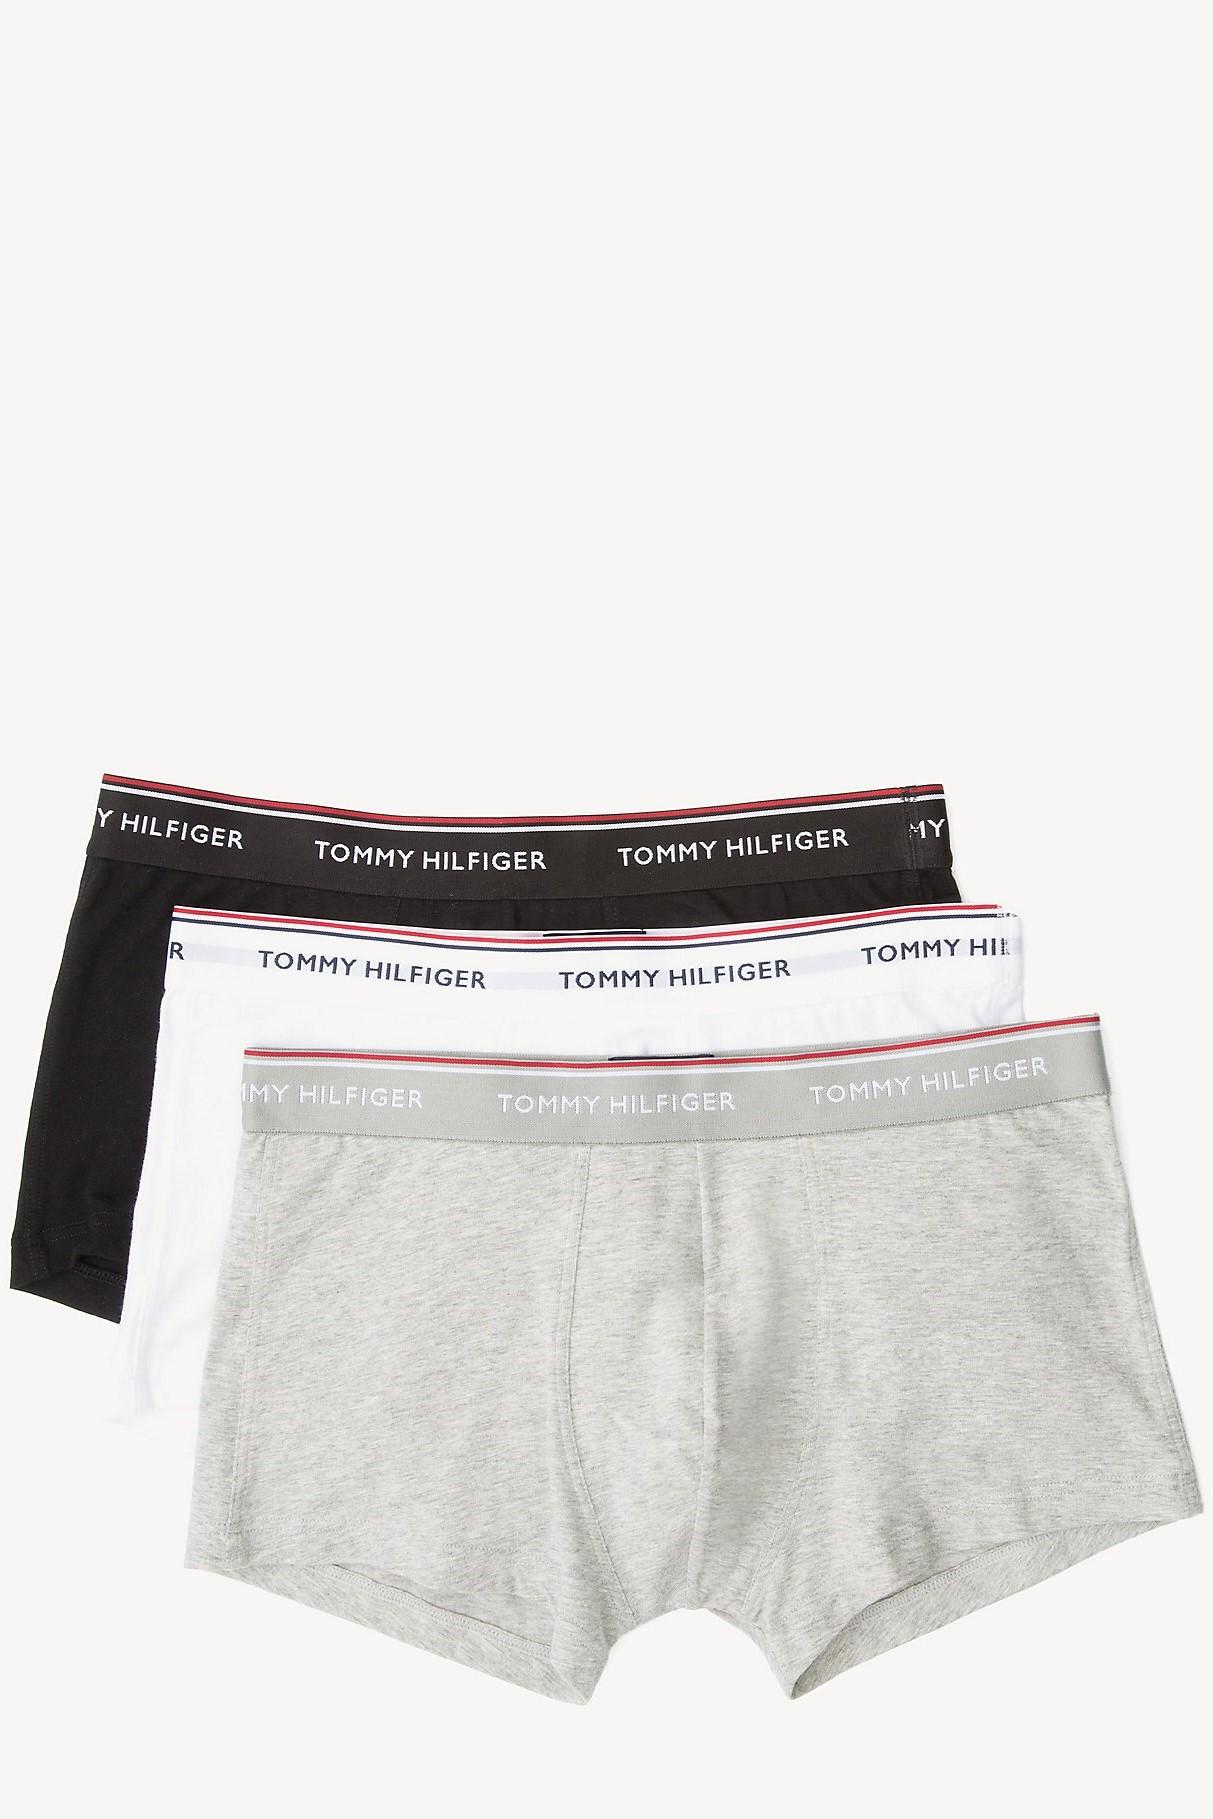 Tommy Hilfiger 3 pack boxerek Low Rise Trunk Premium Ess Basic